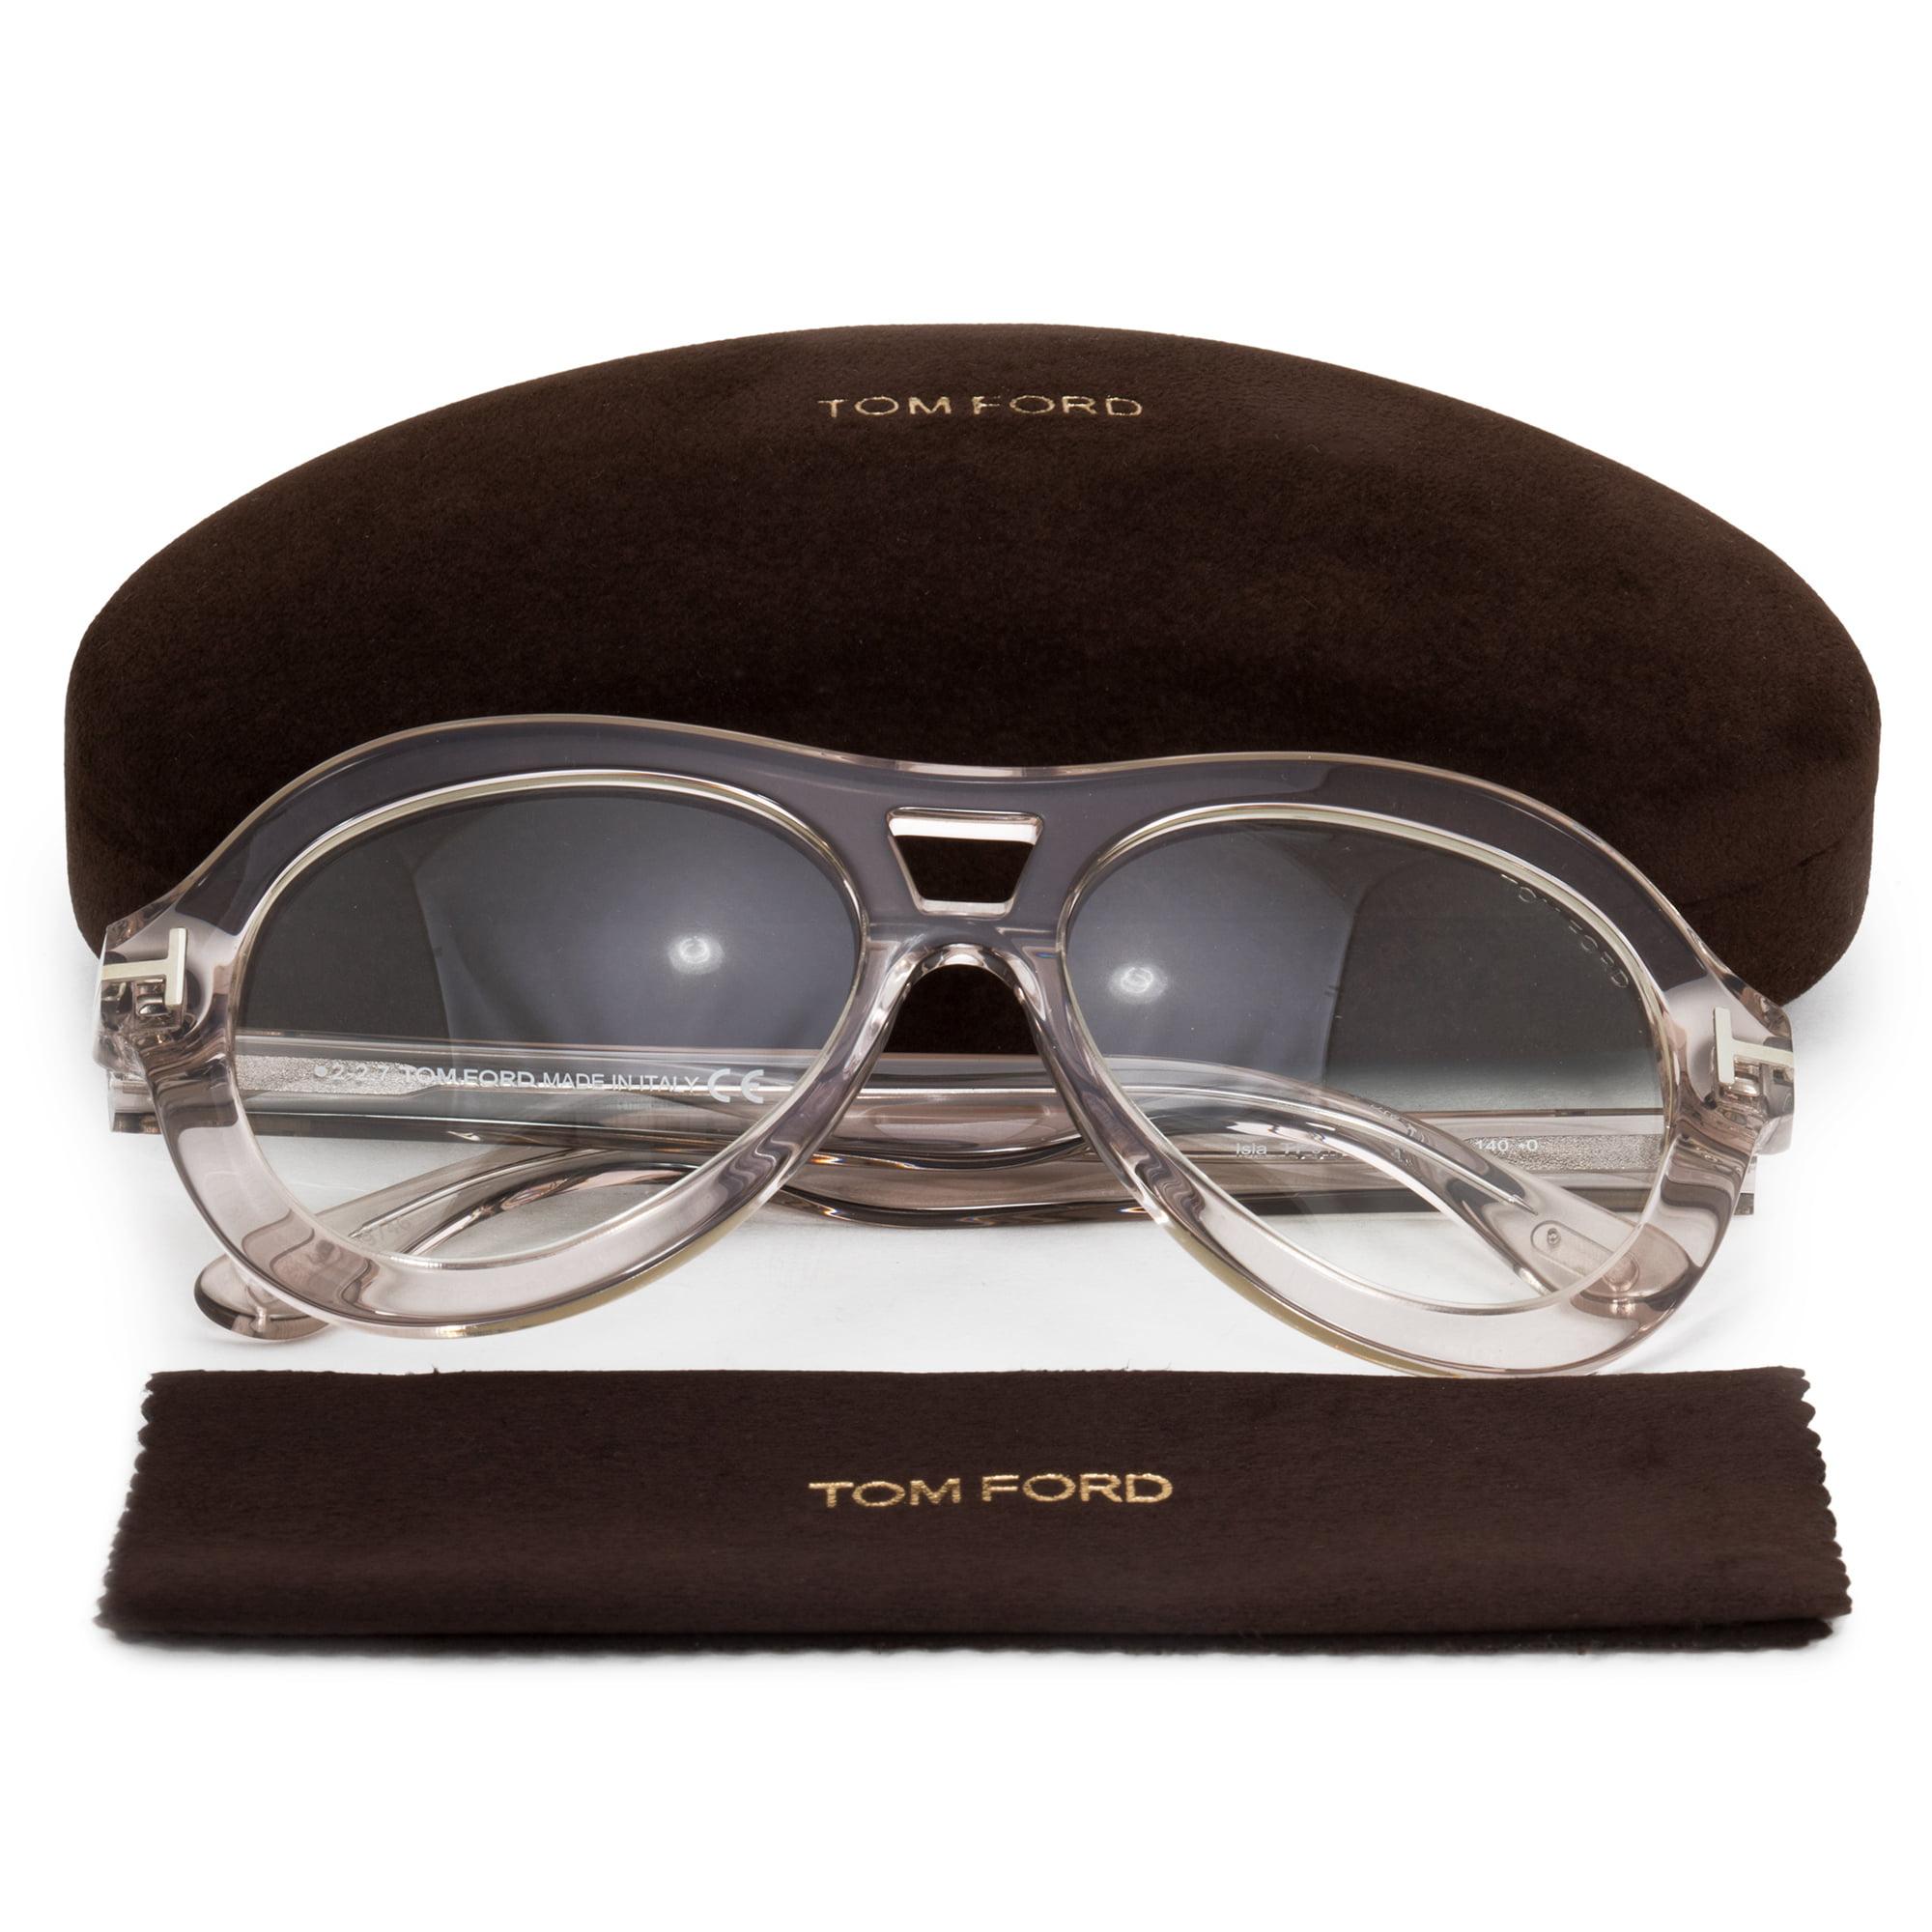 c2ec51c66424 Tom Ford - Tom Ford Isla Round Sunglasses FT0514 074 56 ...